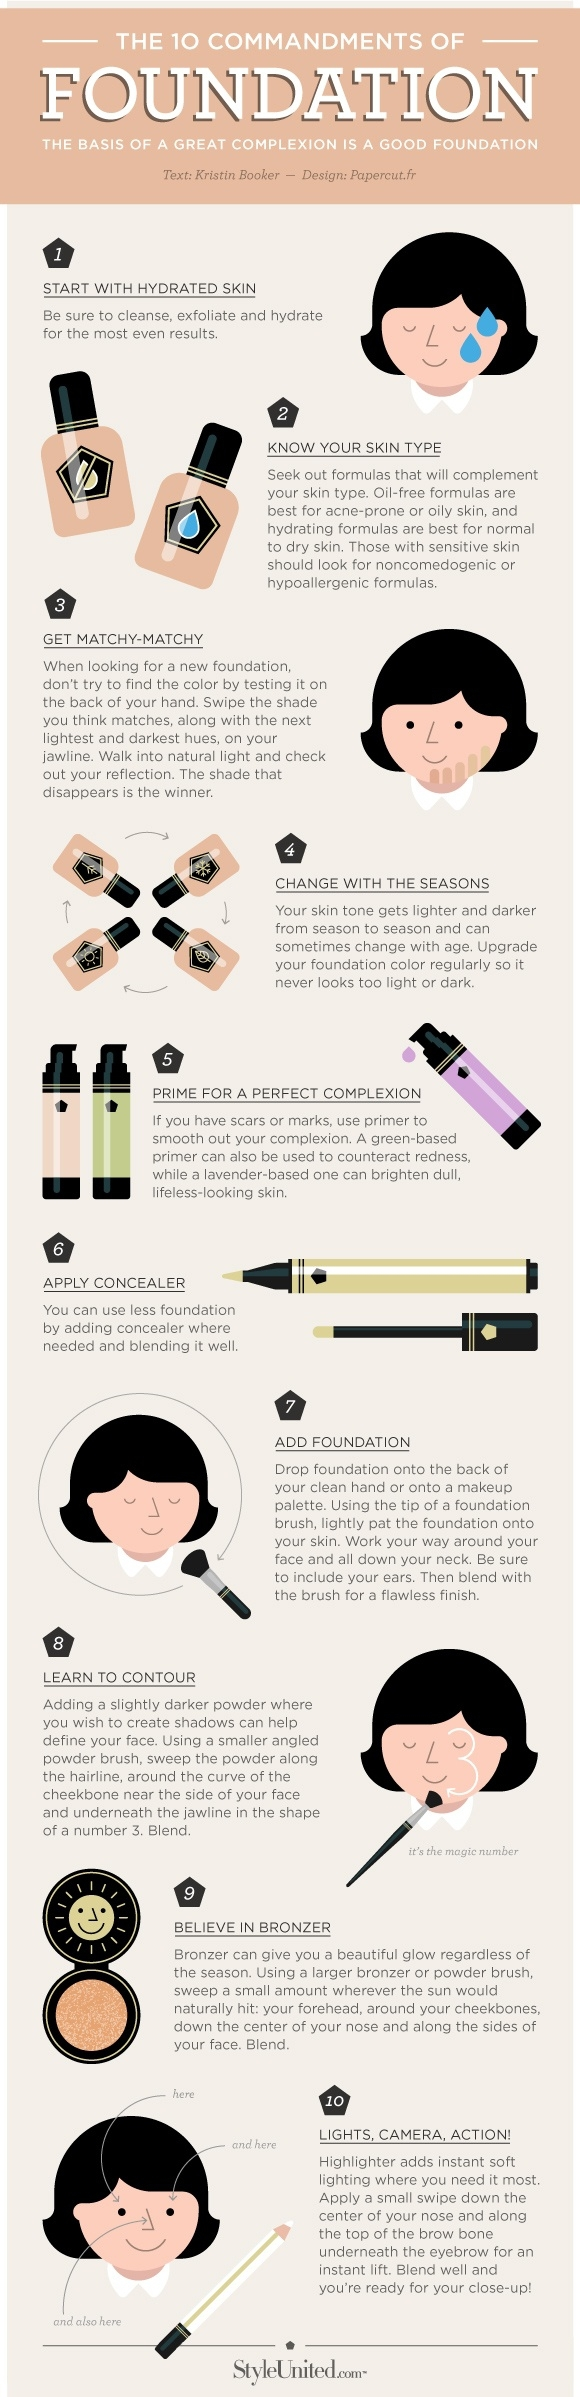 makeupandbodyblog:howtoapplyfoundation.jpg